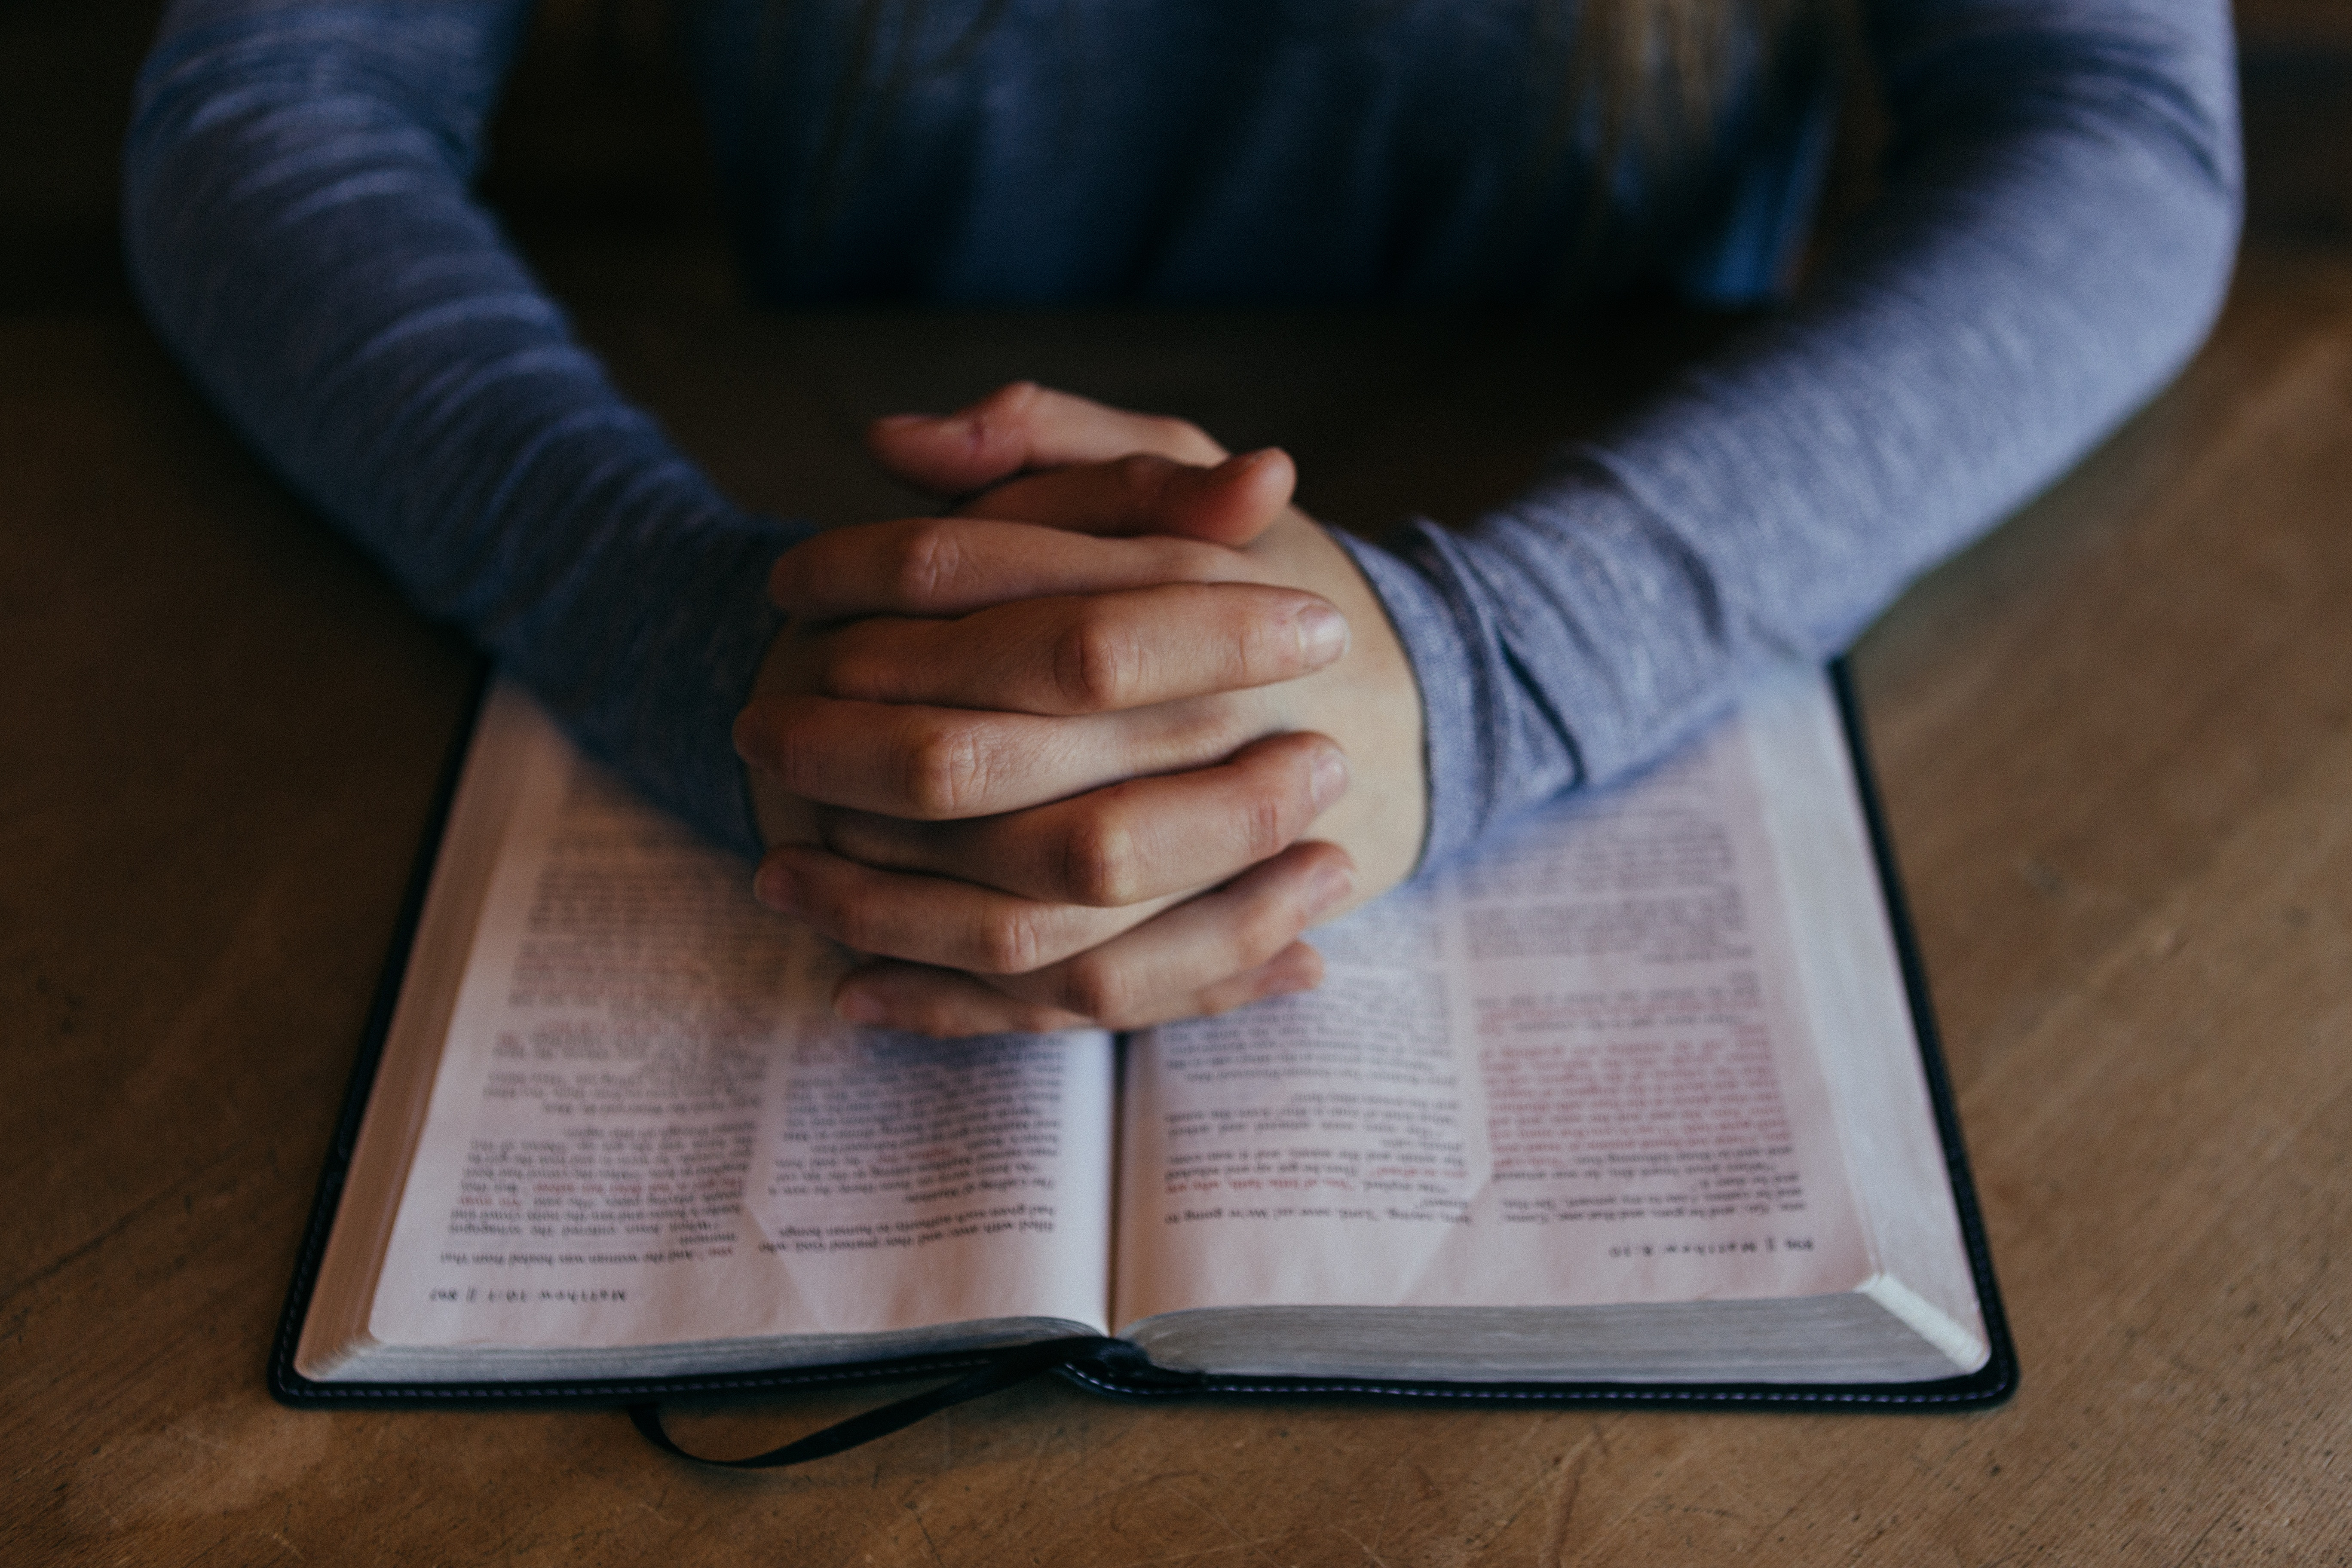 Reform Kabbalat Shabbat Service